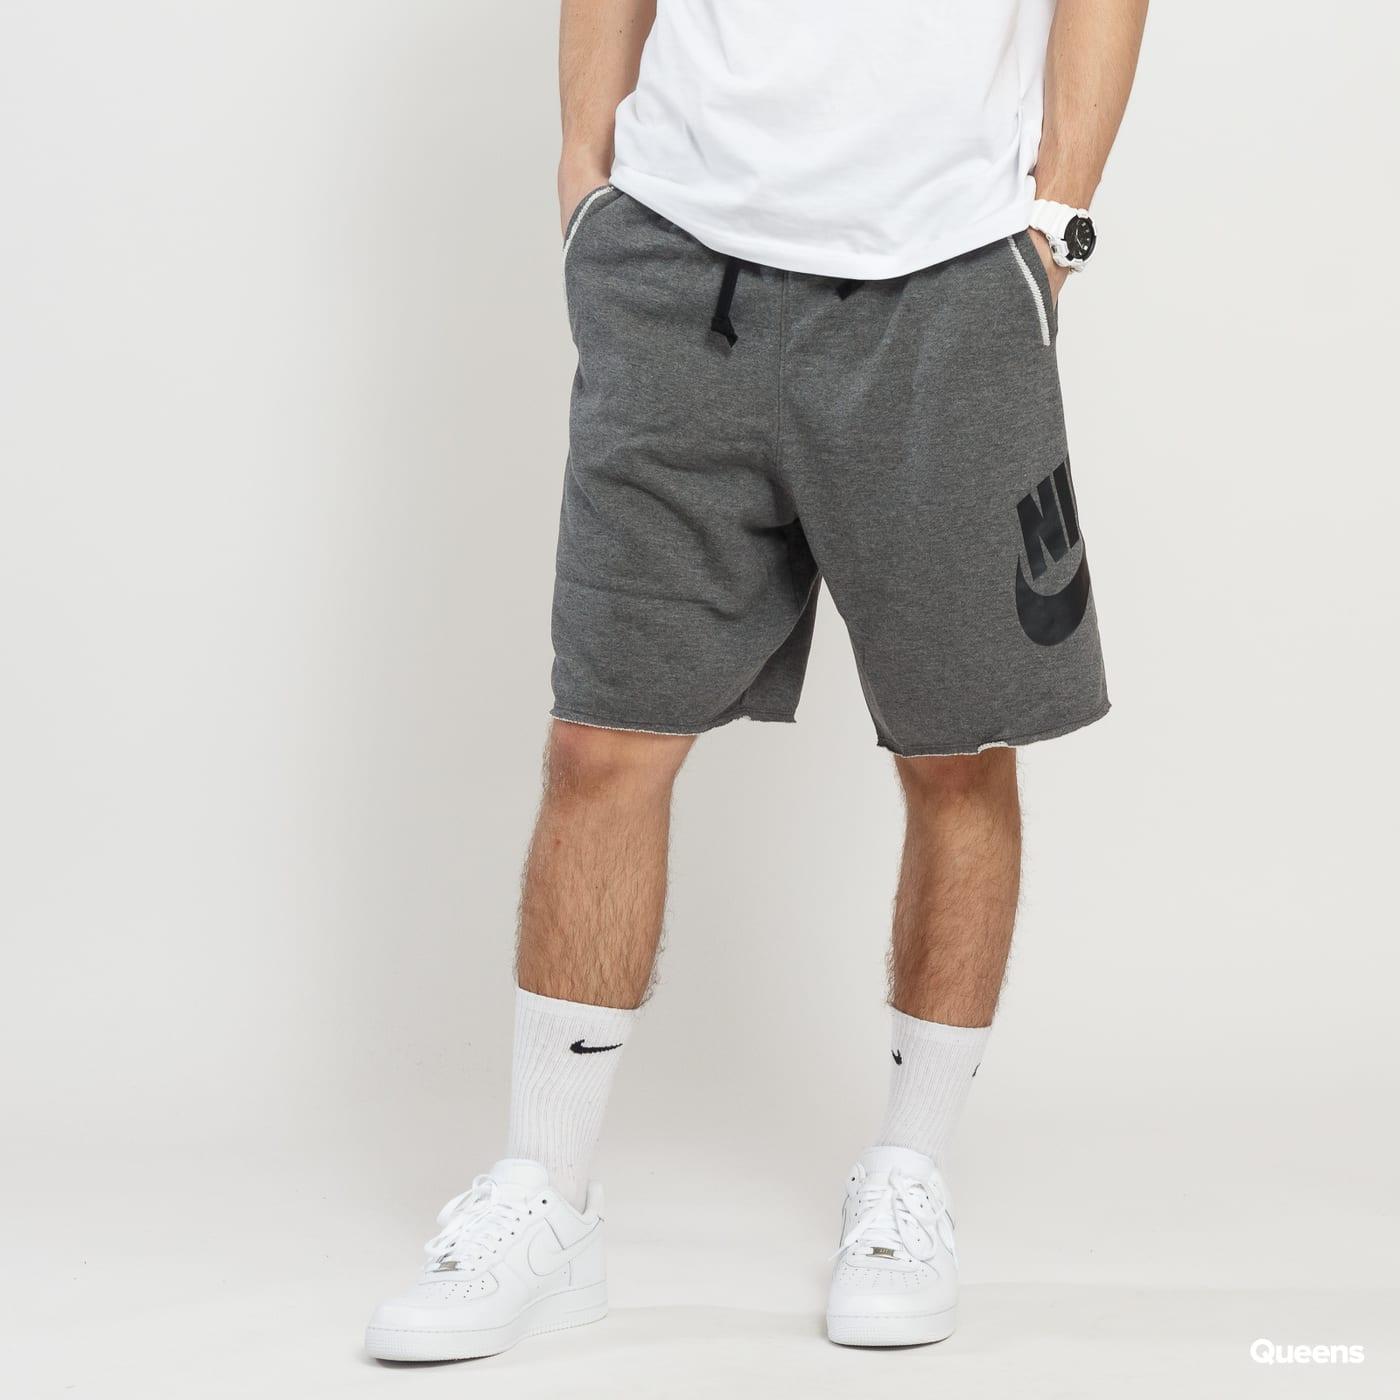 984f138749a64 Sweat Shorts Nike M NSW HE Short FT Alumni melange dark gray (AR2375-071) –  Queens 💚